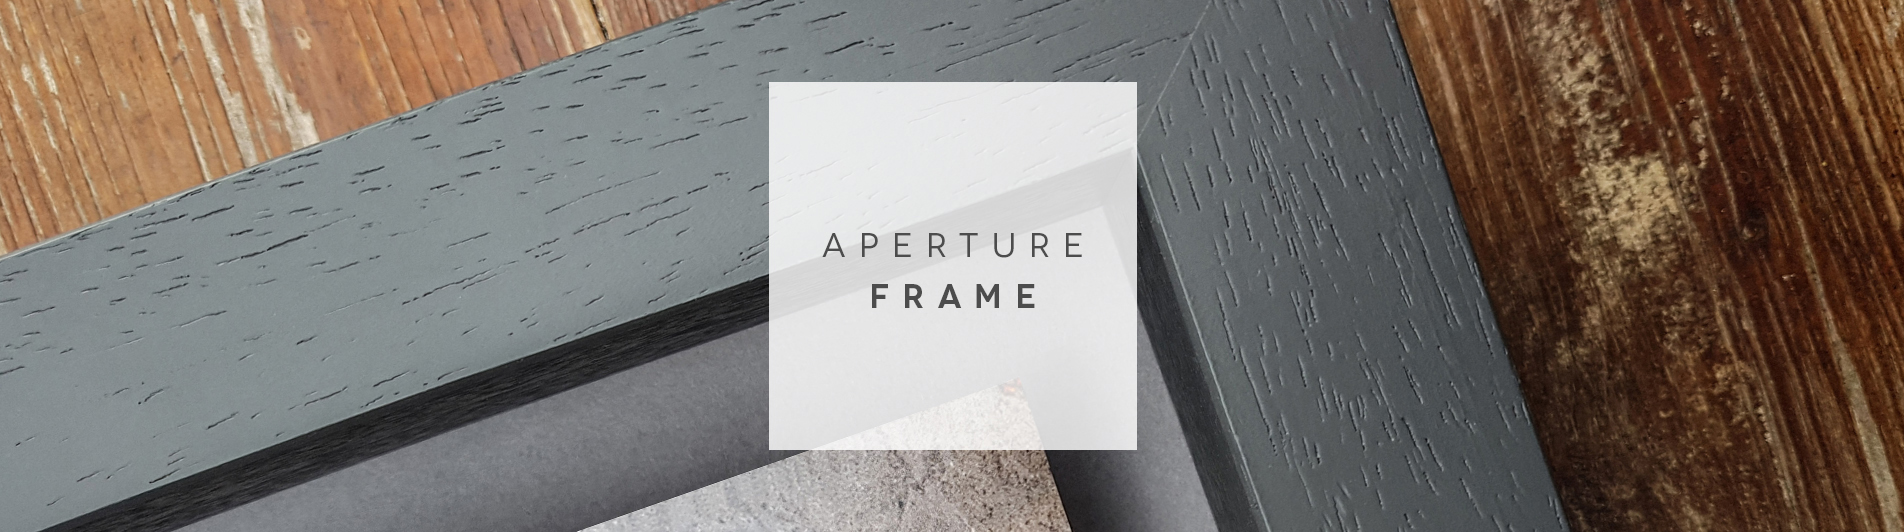 aperture frame